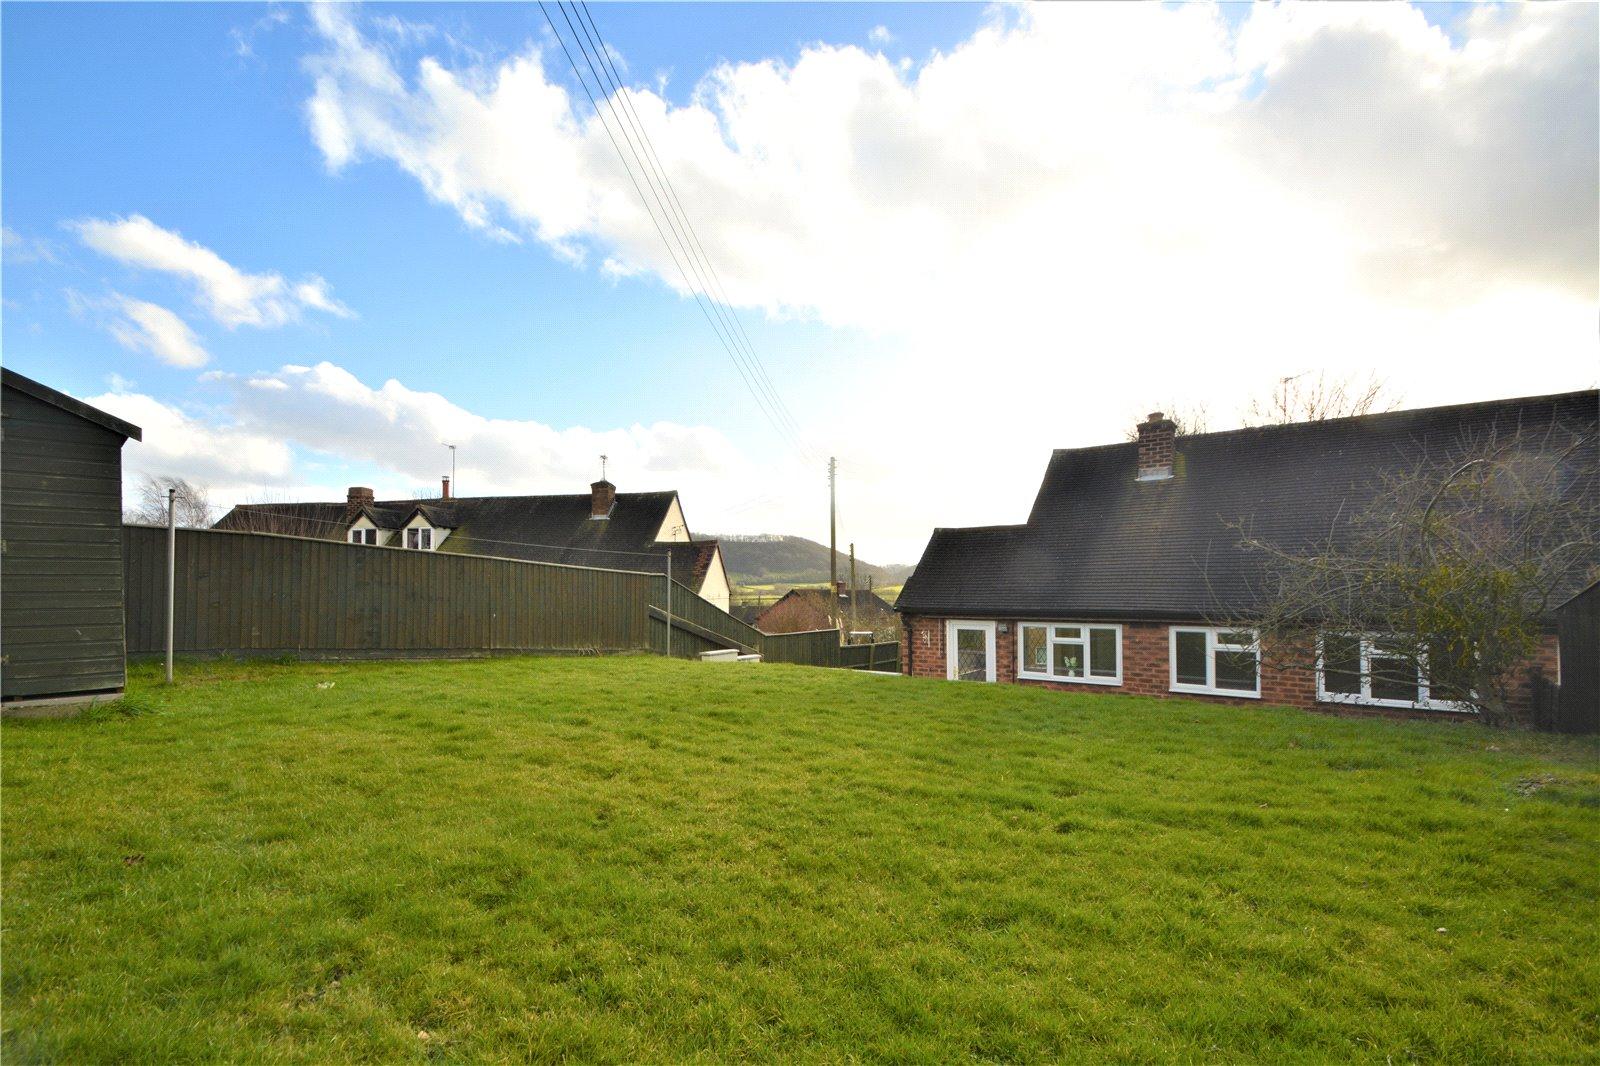 2 Bedrooms Semi Detached Bungalow for sale in 29 Park View, Buildwas, Shropshire, TF8